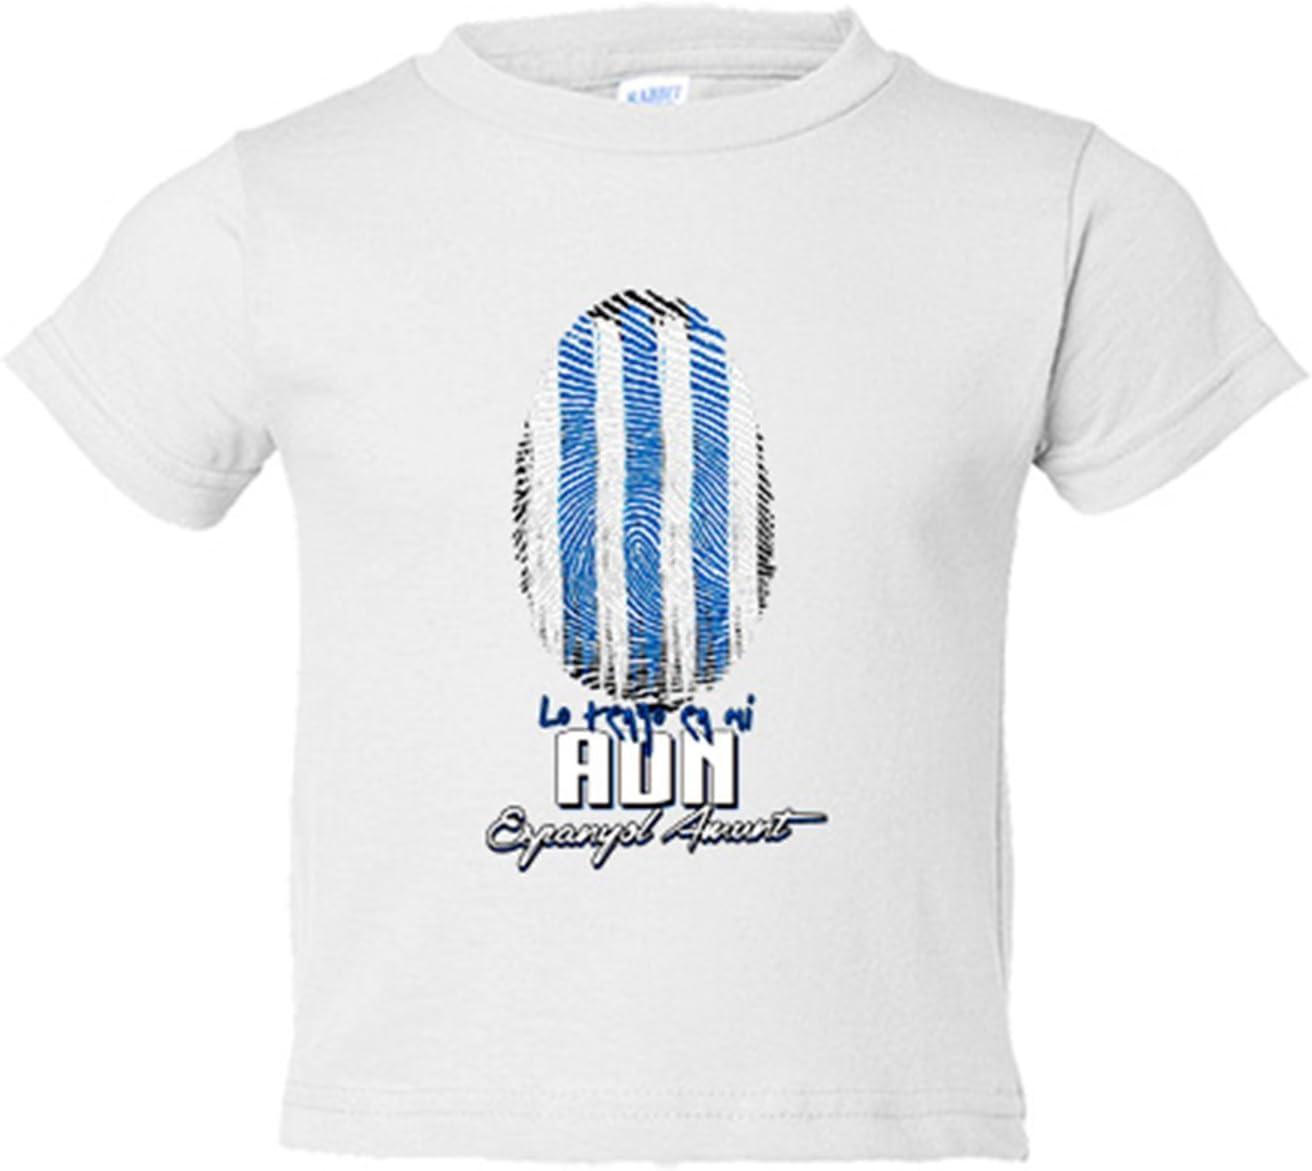 Camiseta niño lo tengo en mi ADN Espanyol fútbol - Blanco, 3-4 ...